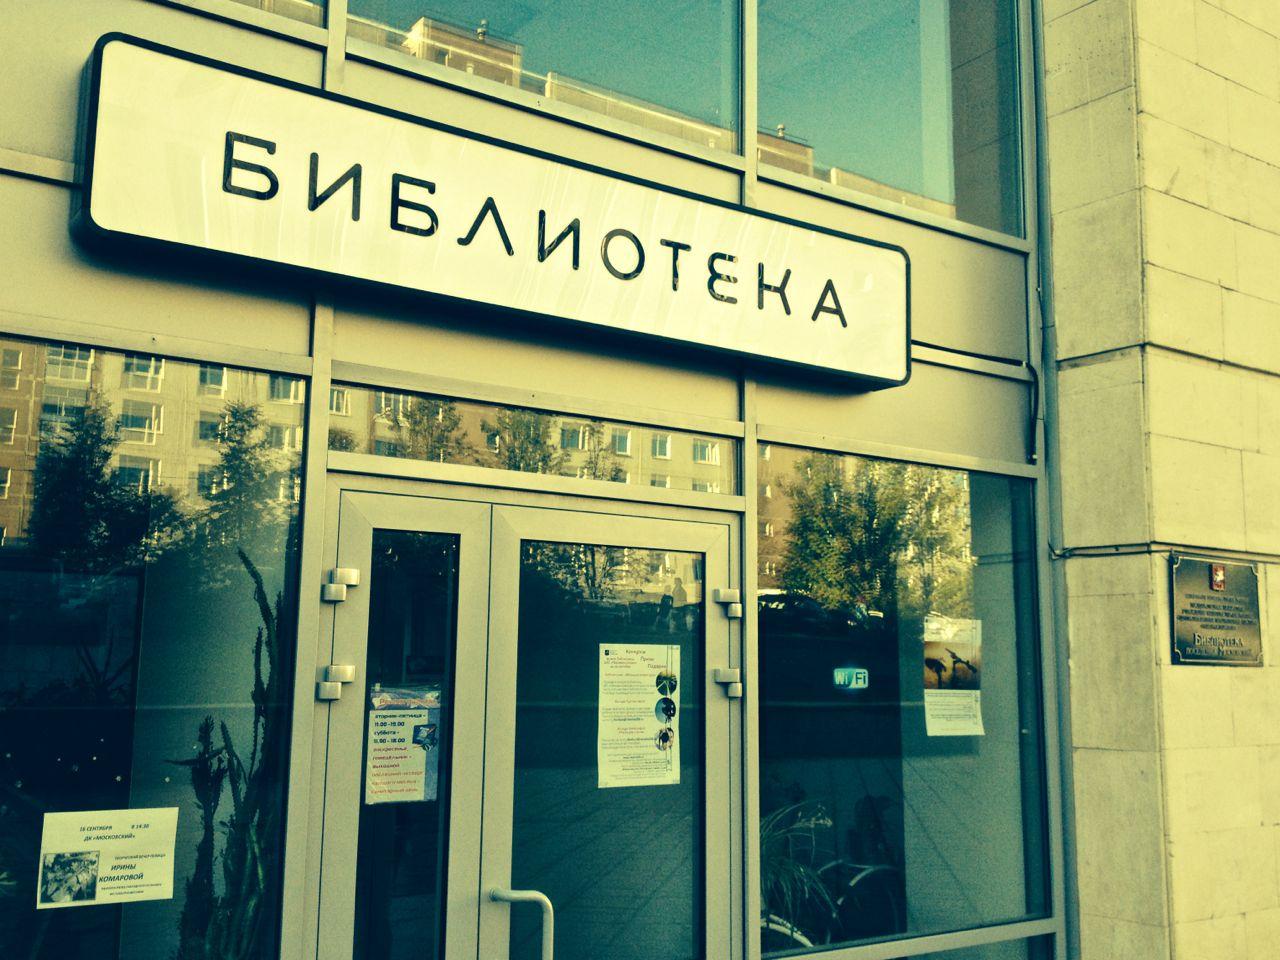 ЦБС Новомосковская